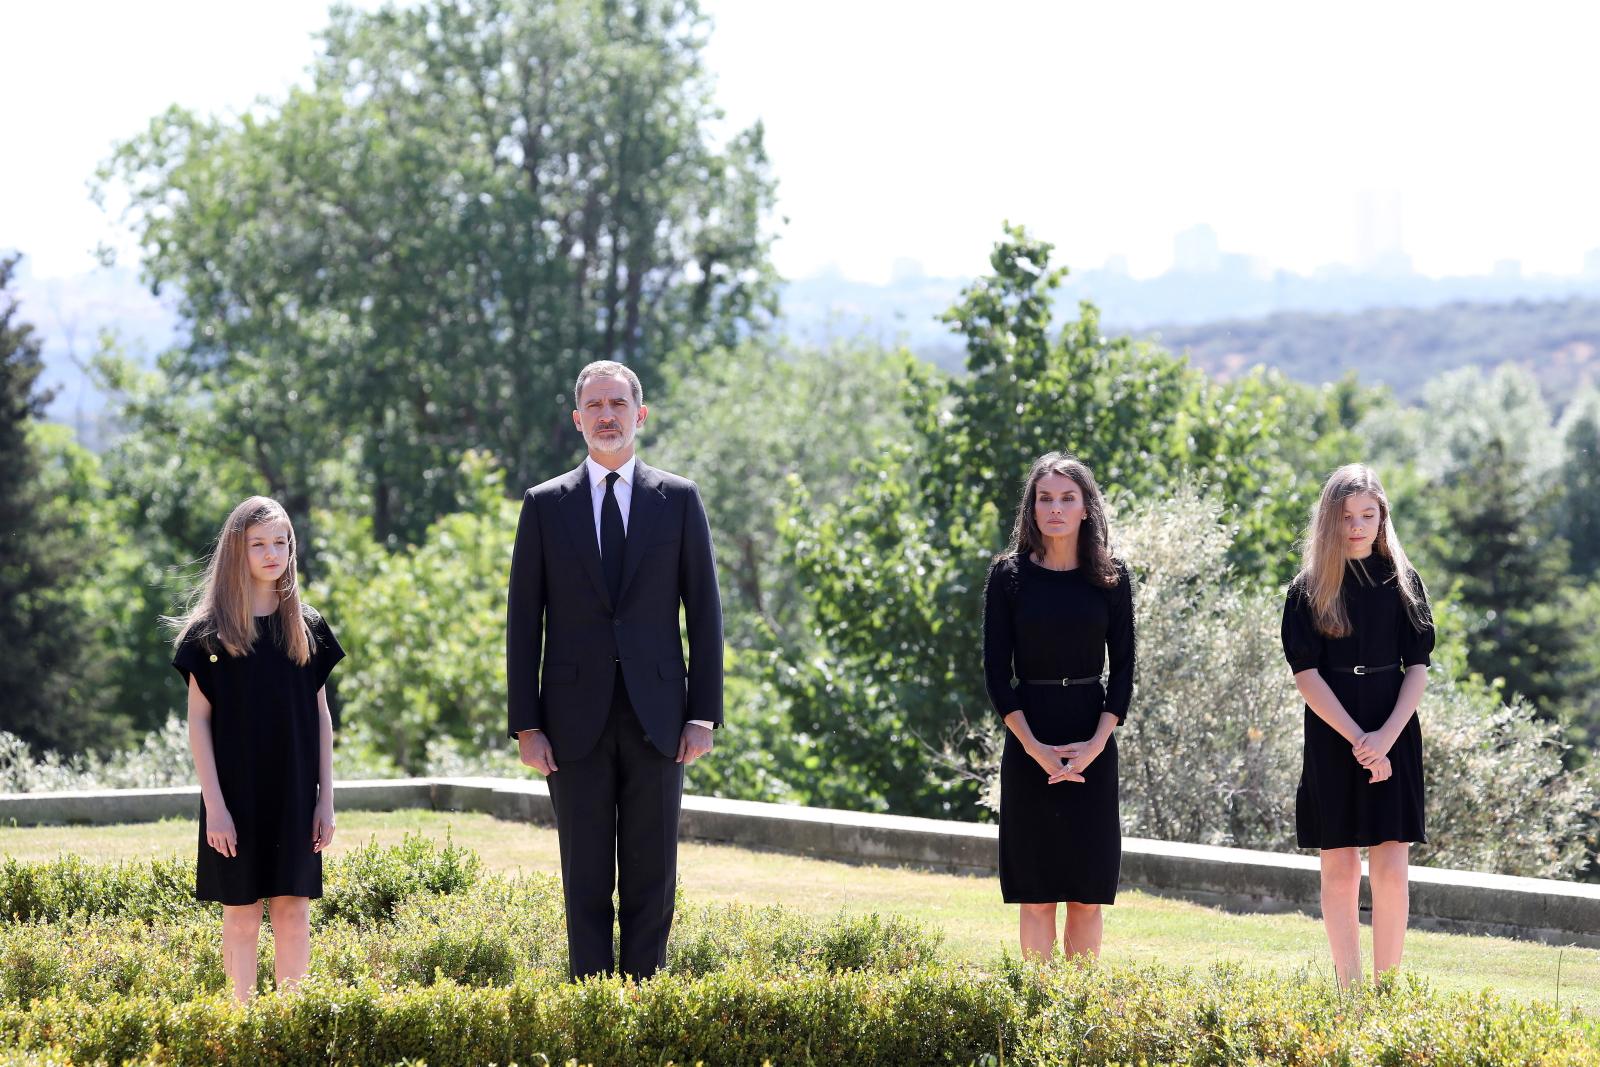 Hiszpańska rodzina krówska   EPA/Jose Jimenez / Spanish Royal Household